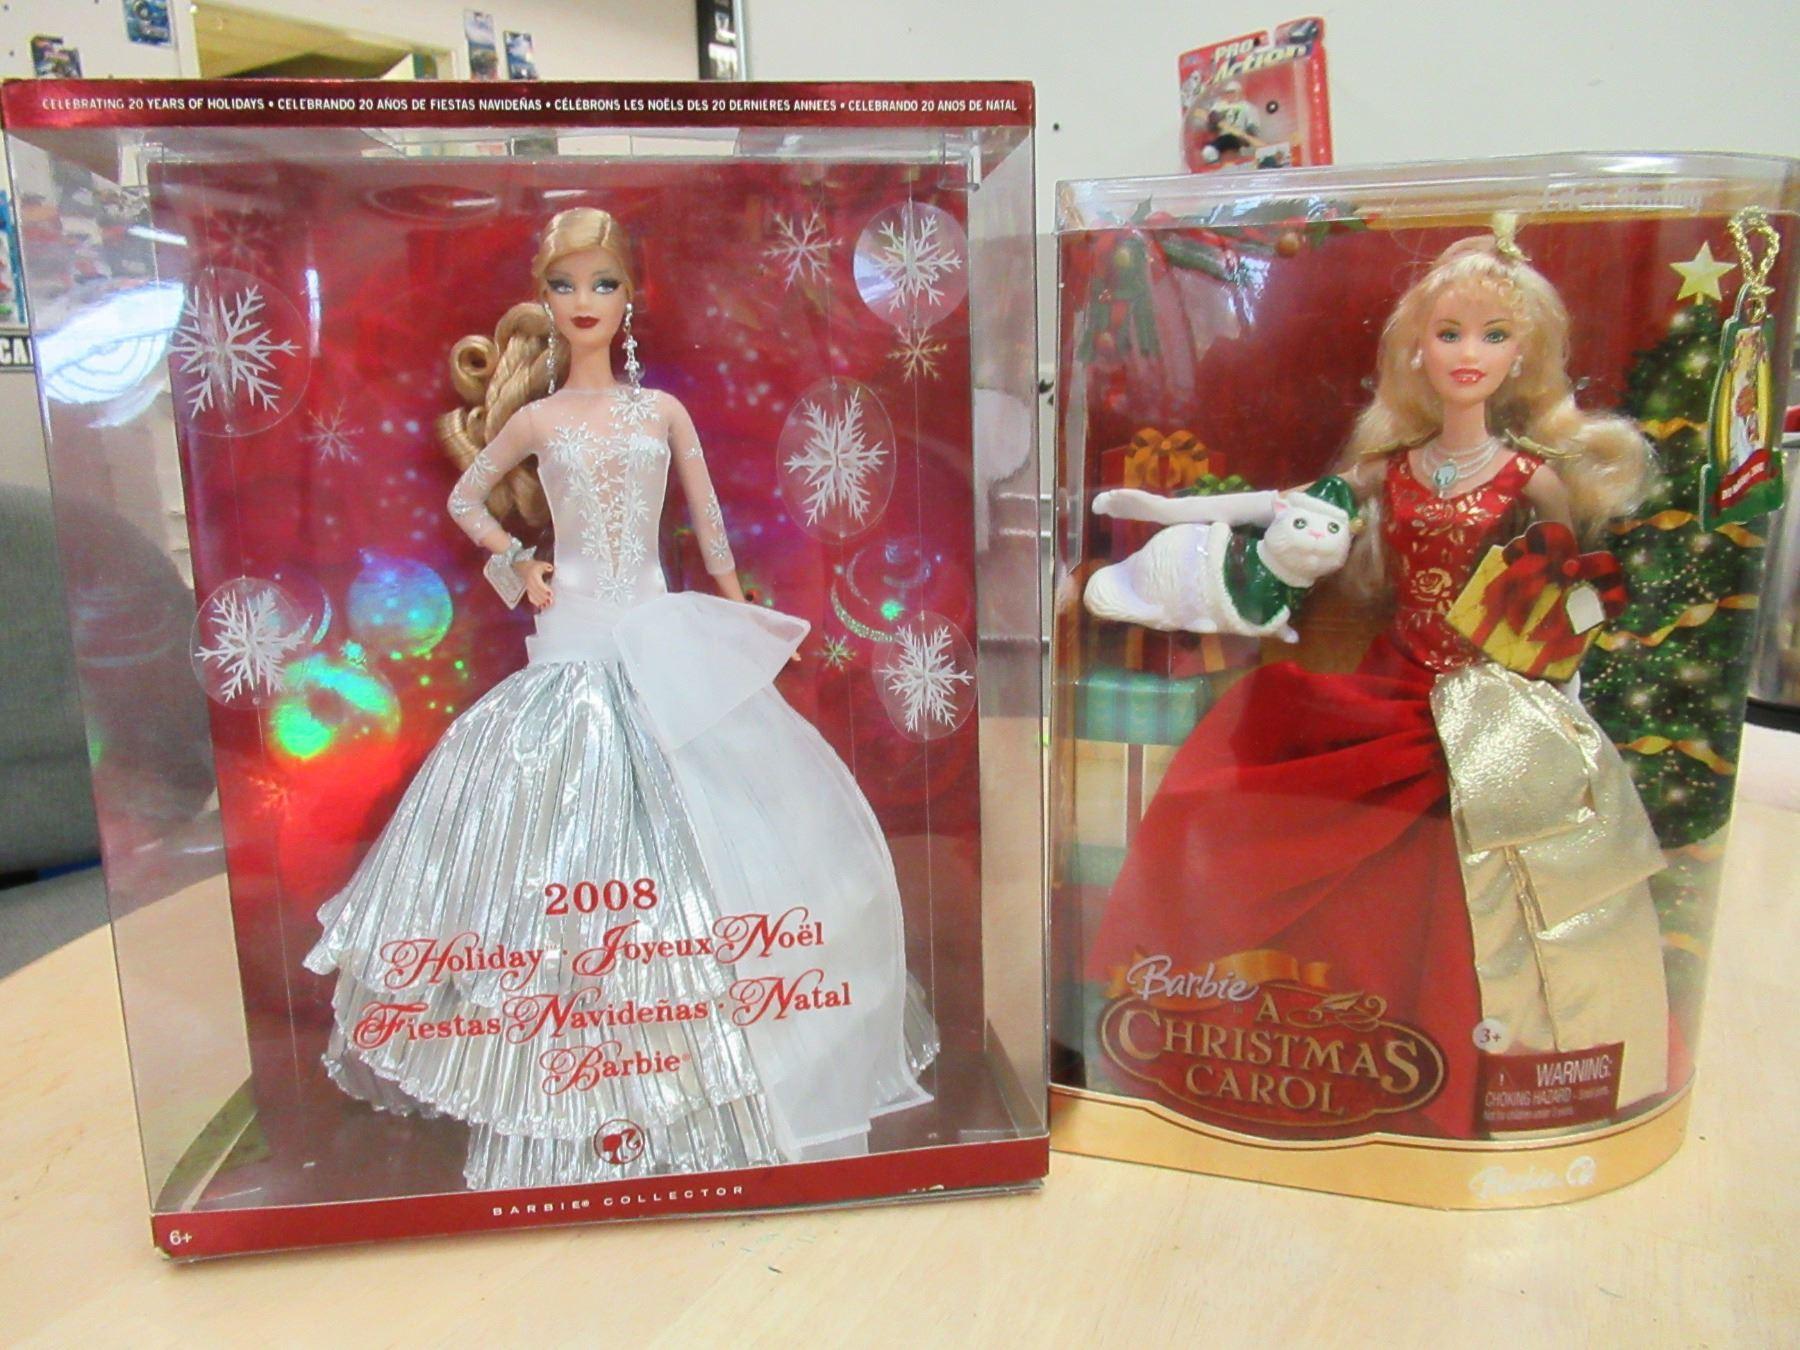 2008 Barbie In A Christmas Carol 2008 Holiday Barbie